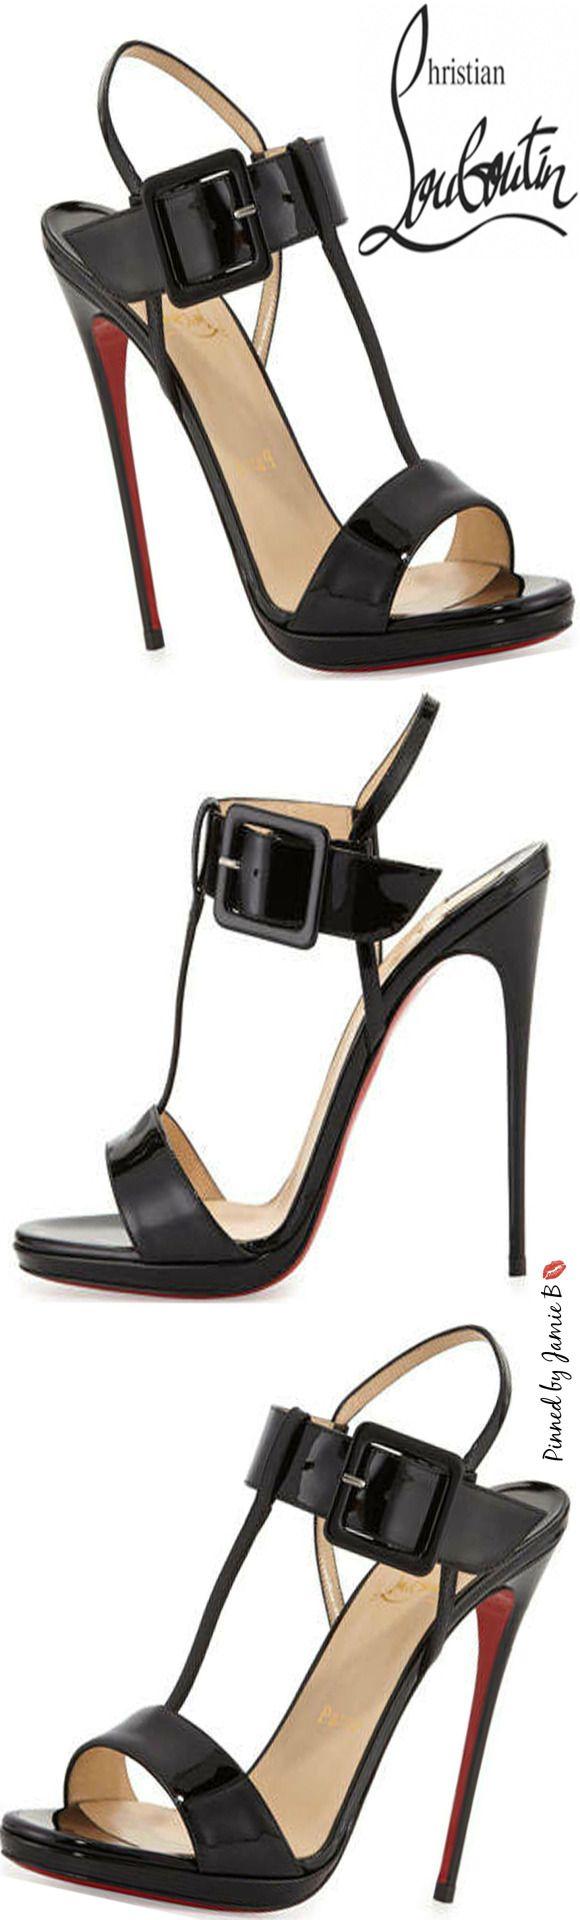 blessedshoegirl2:  Christian Louboutin |Beltega Patent Red Sole Sandal | Jamie B